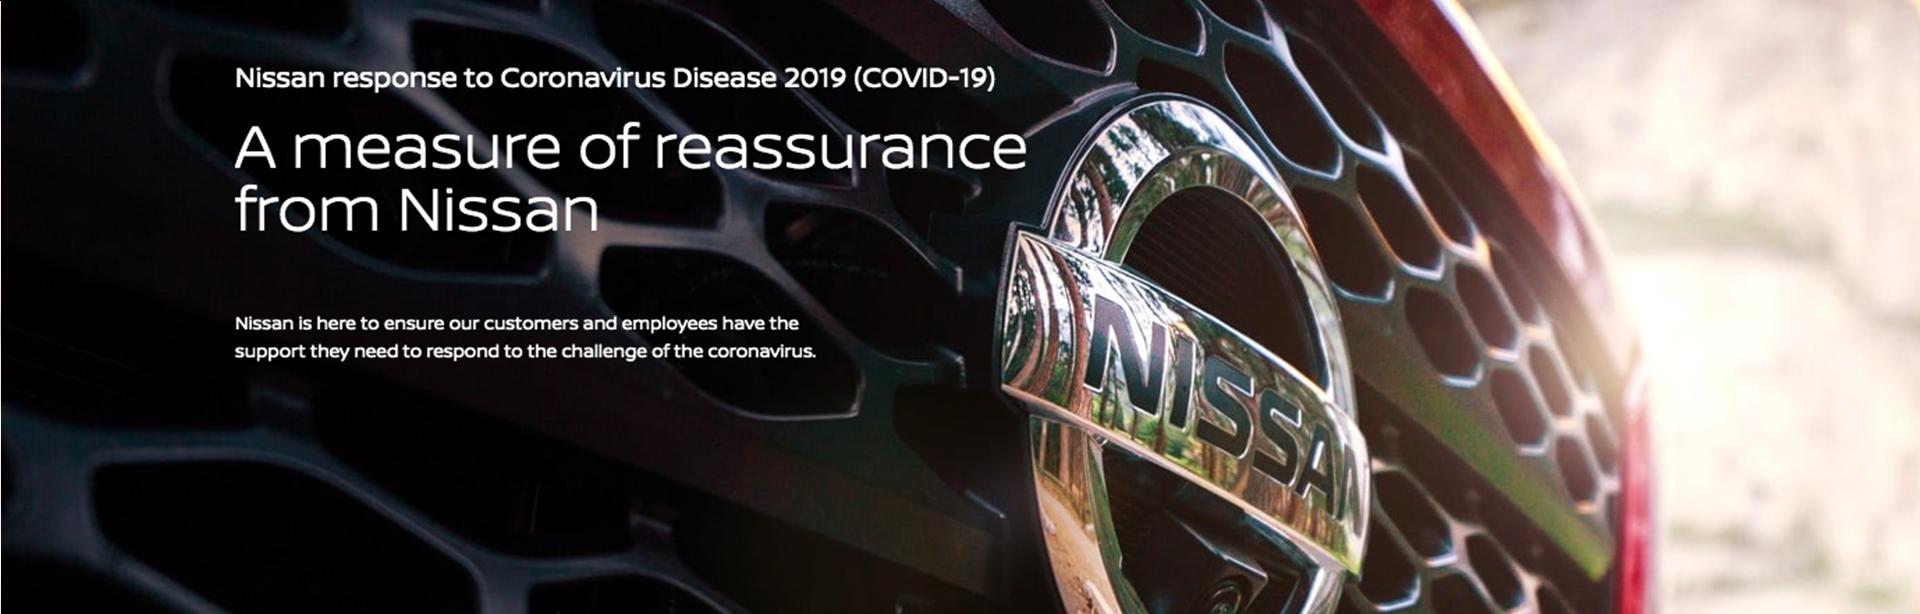 Nissan USA COVID-19 Response-Nissan-of-Lumberton-response-to-Coronavirus-Disease